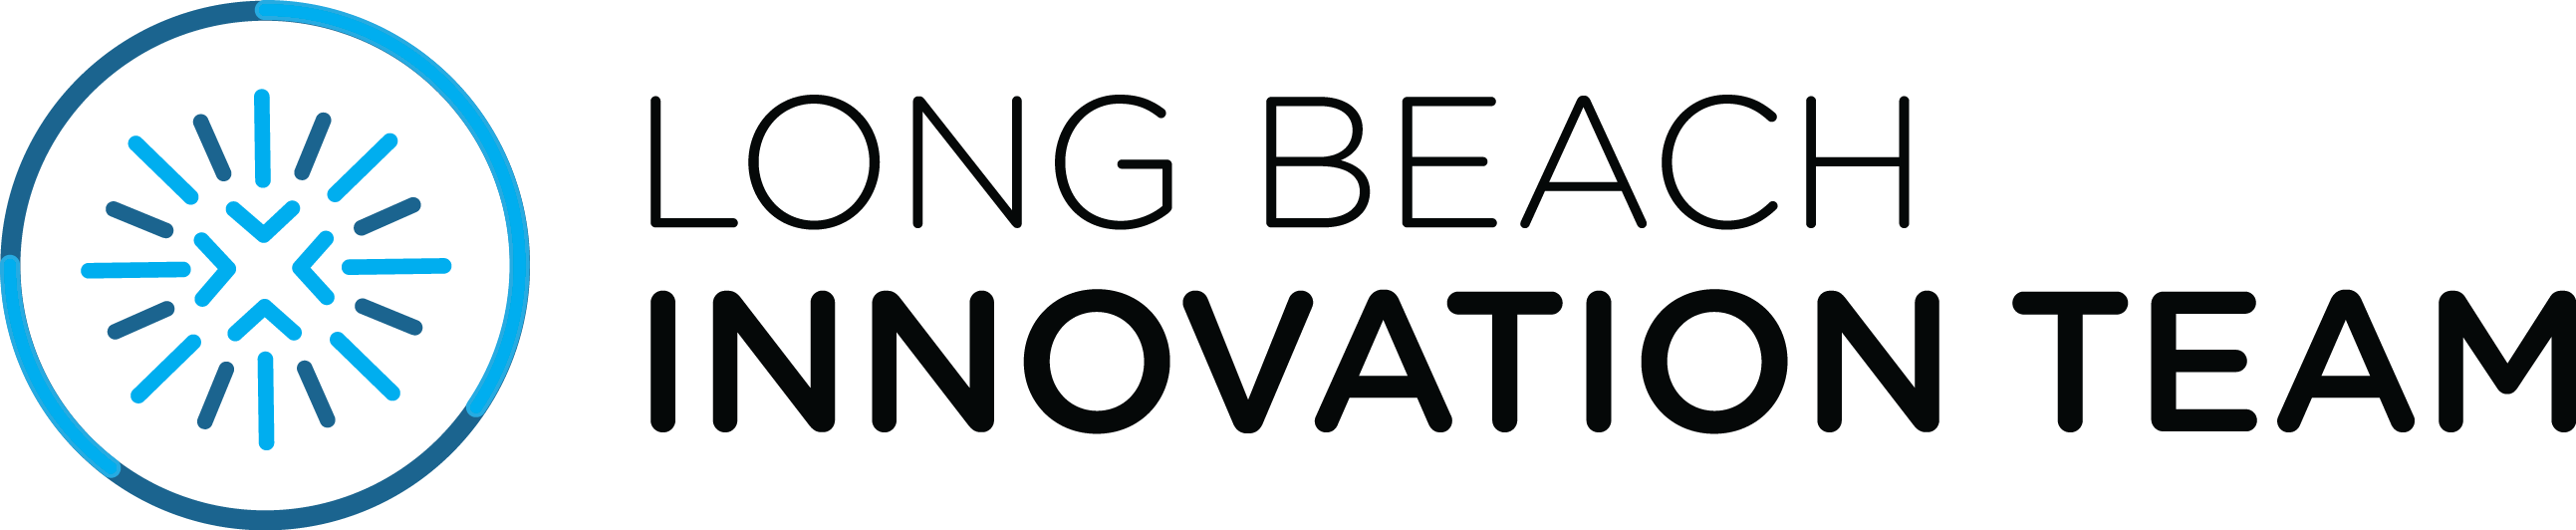 LB_Innovation_Team.png